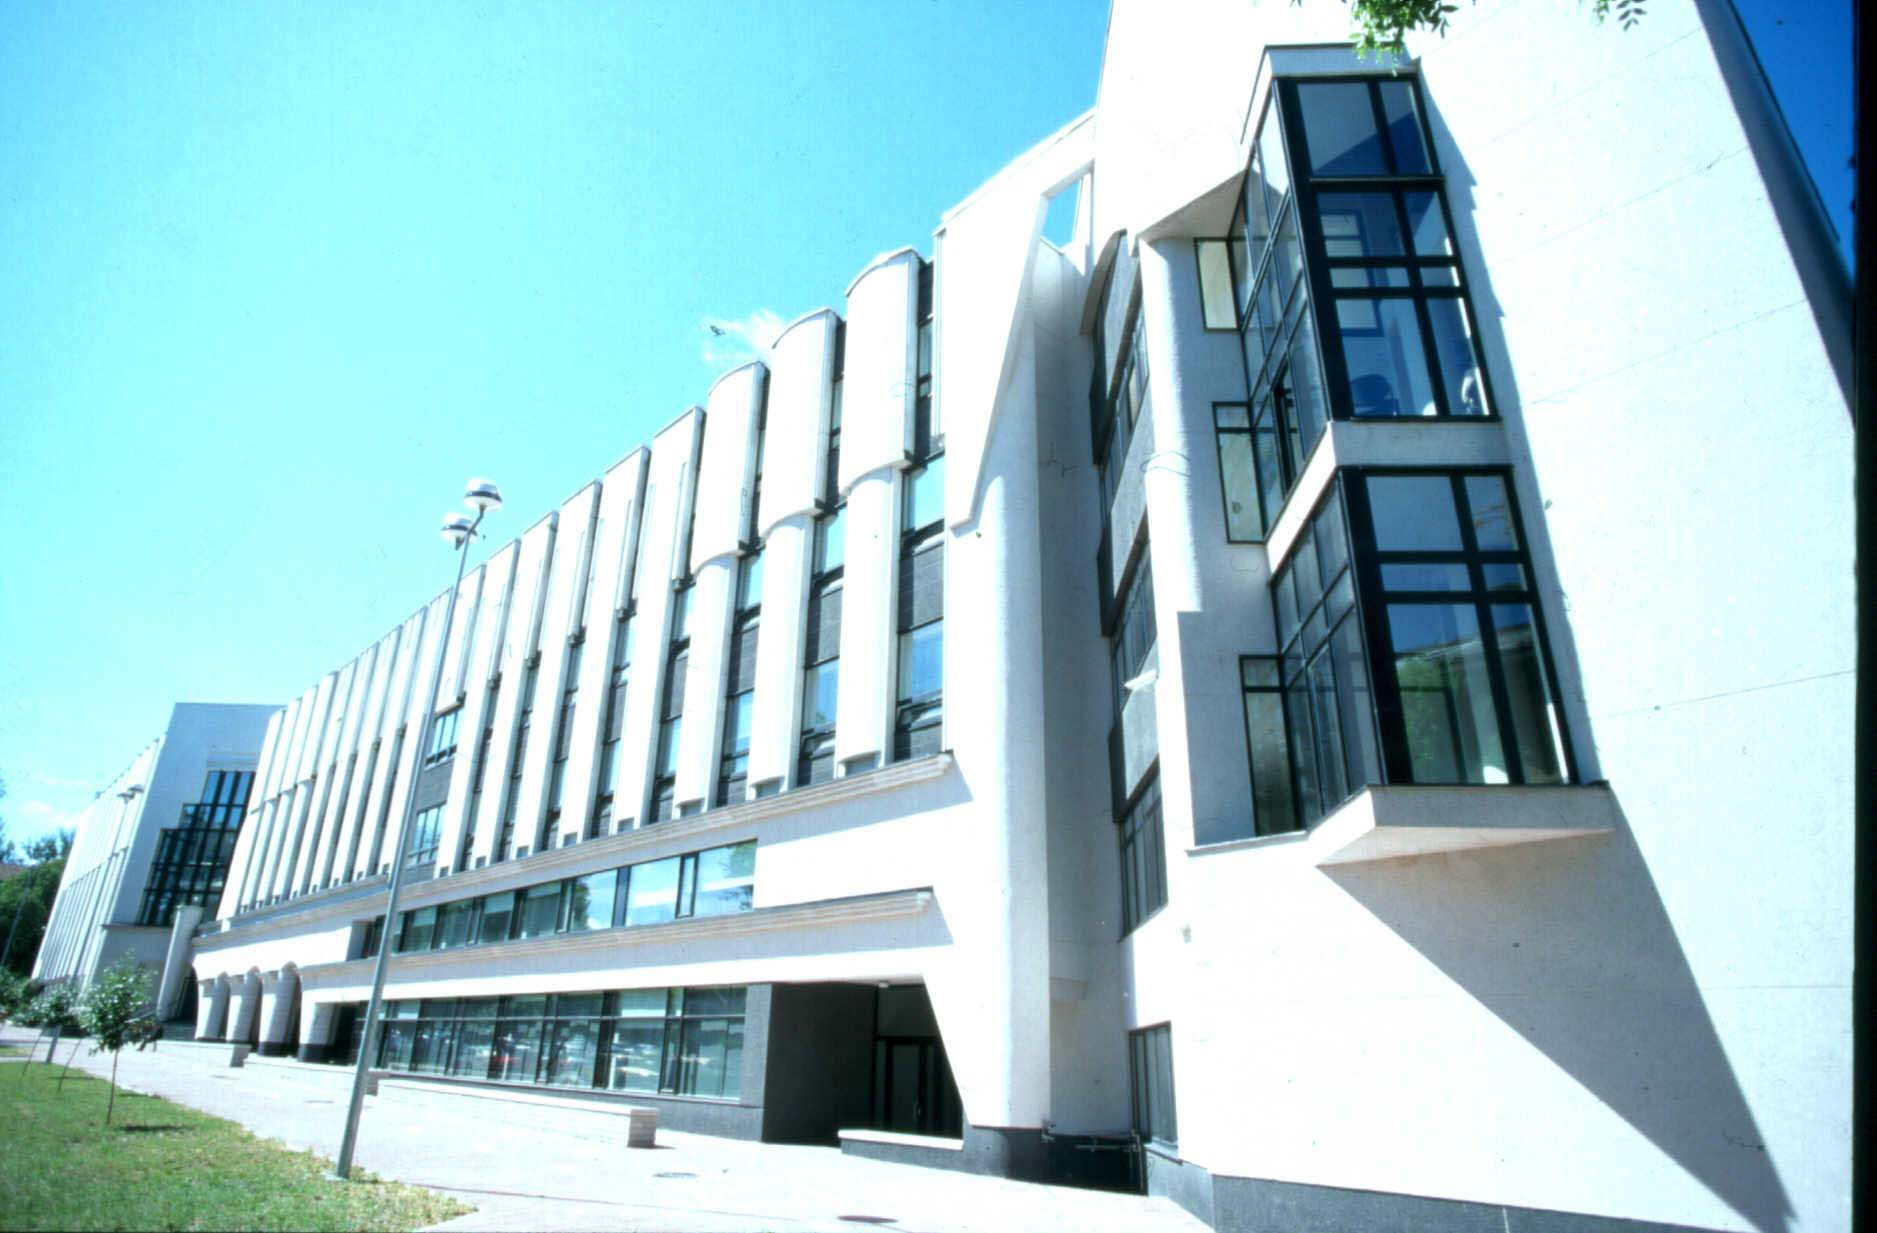 Estonian Academy of Music and Theatre, venue for the ISME MISTEC  pre conference seminar 2020